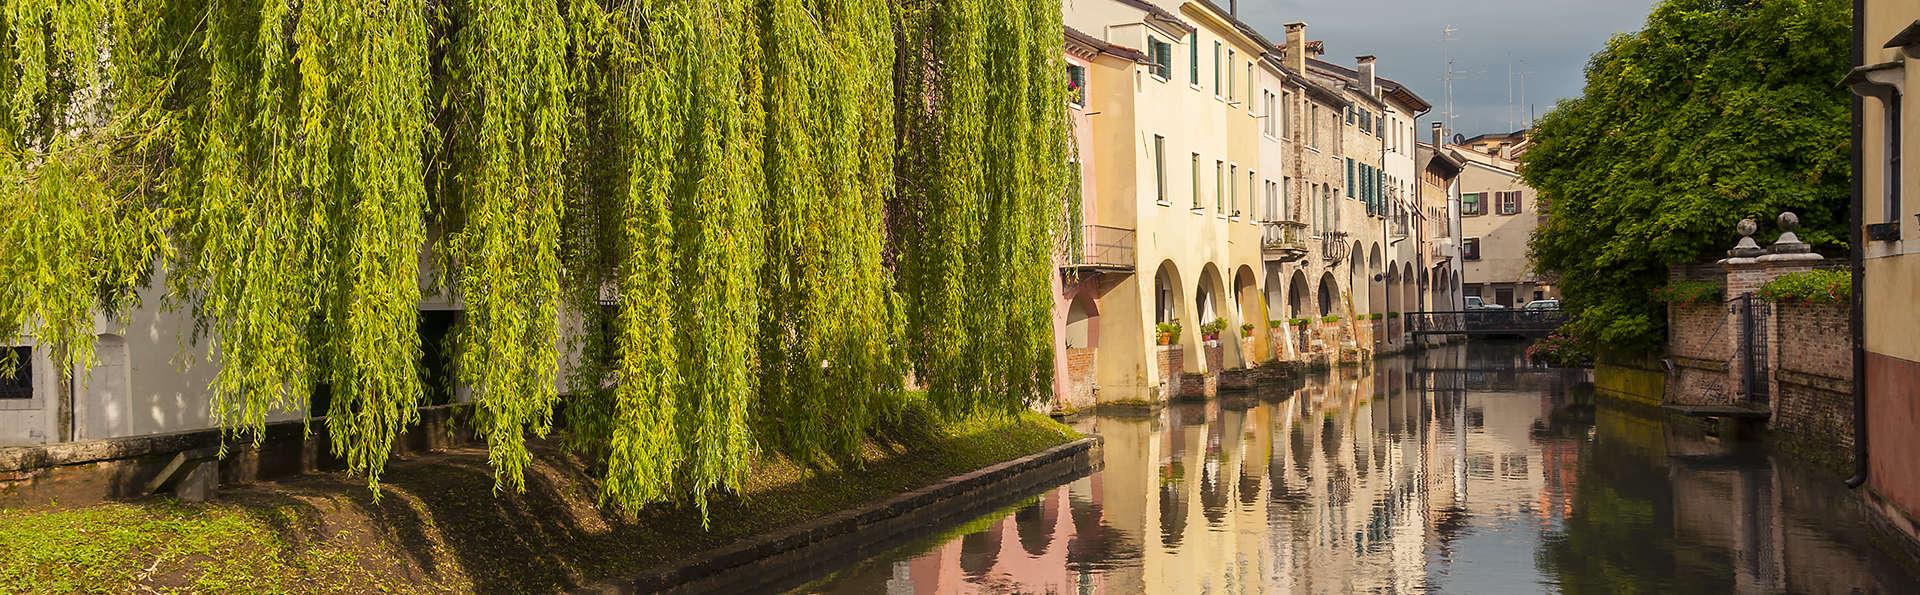 Best Western Titian Inn Hotel Treviso - Edit_Treviso.jpg